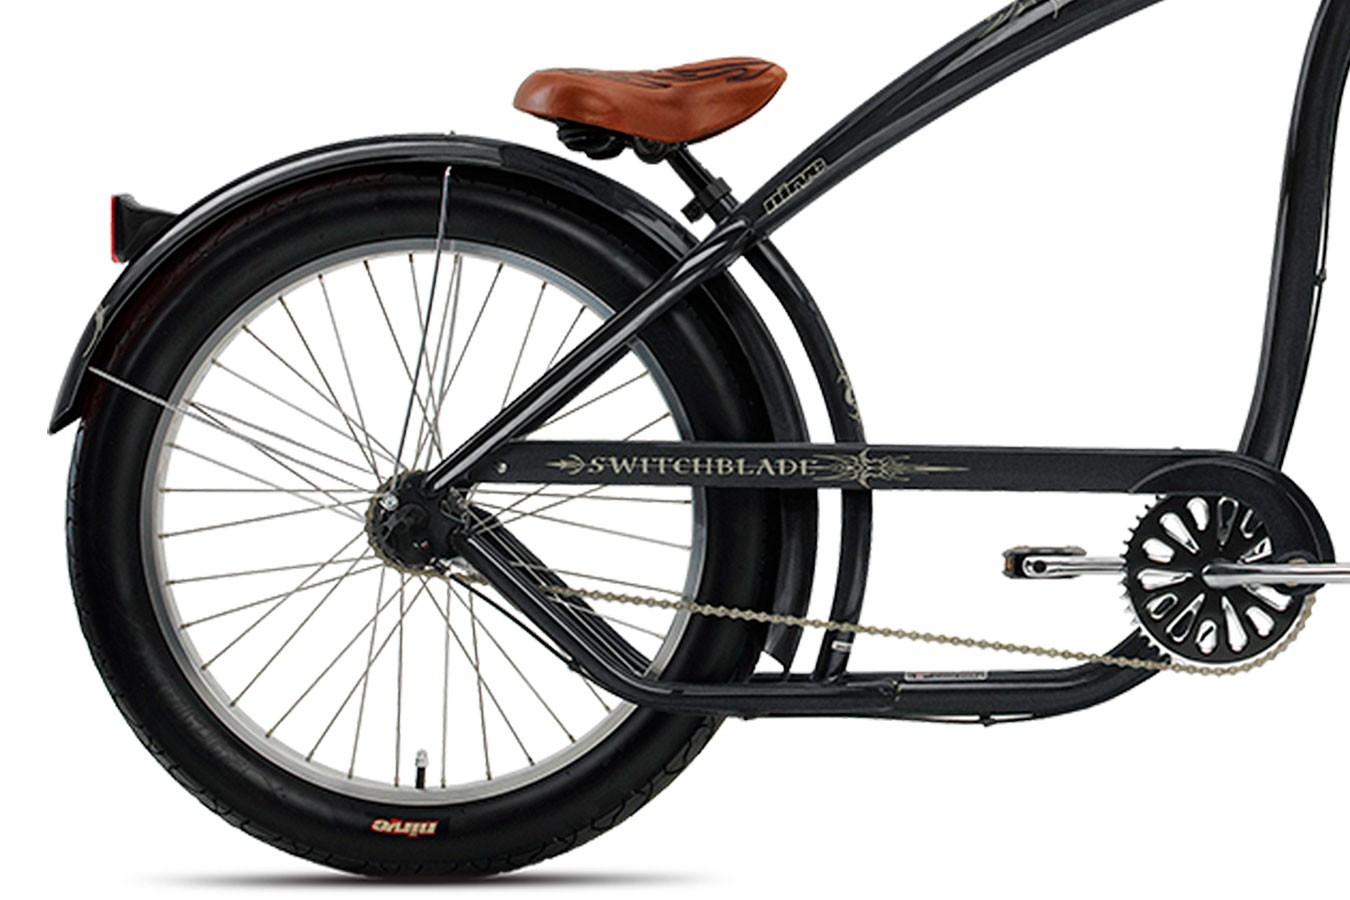 Bicicleta Chopper Switchblade Nirve